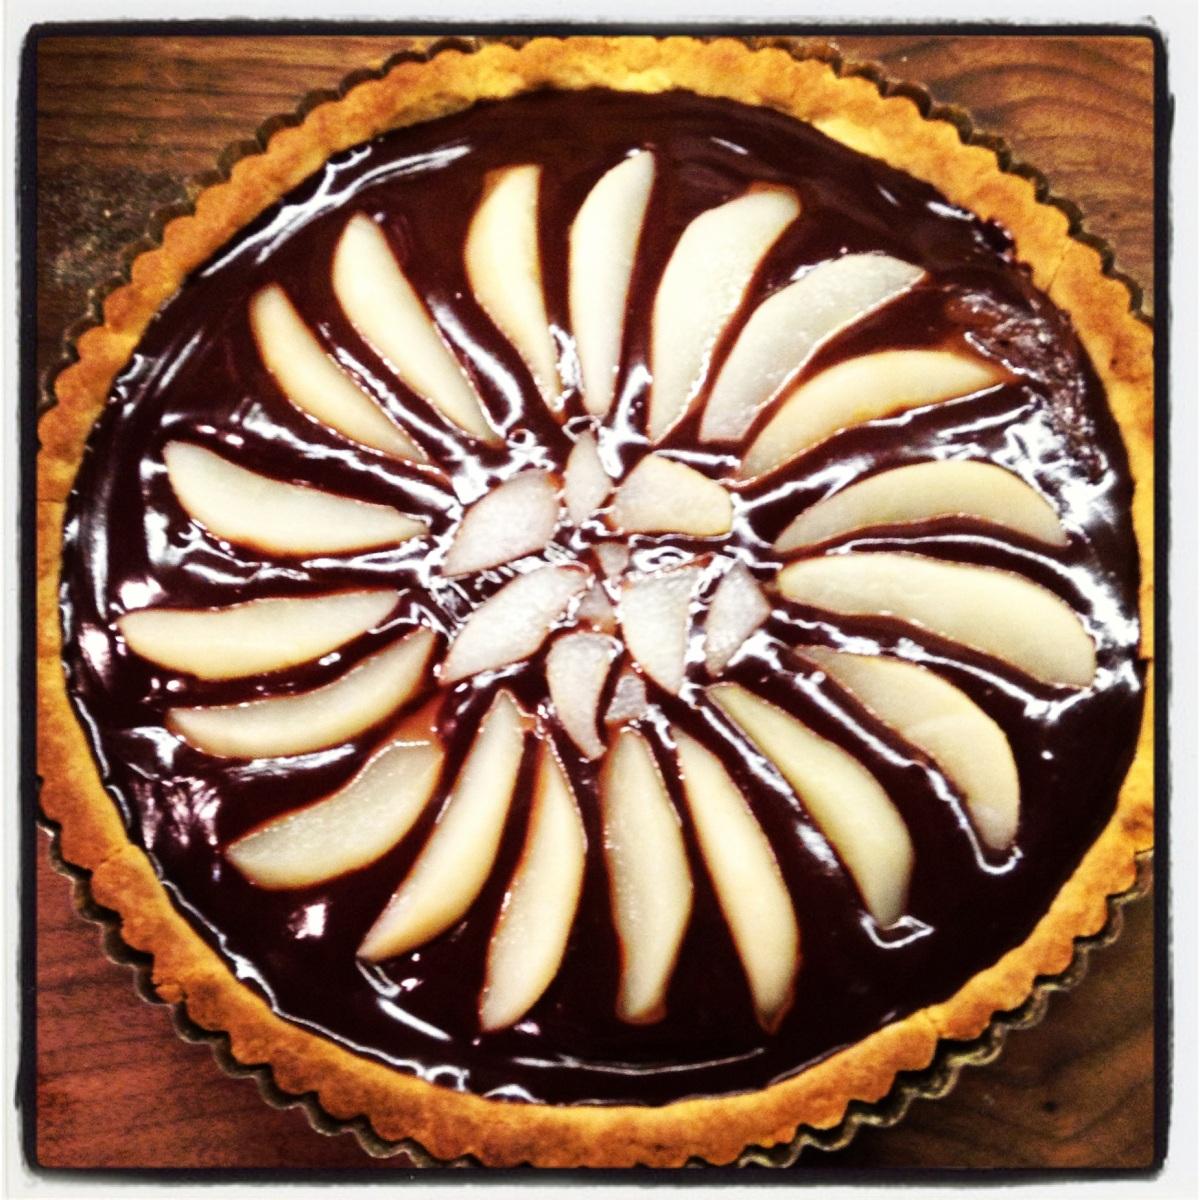 Chocolate and Pears Tart